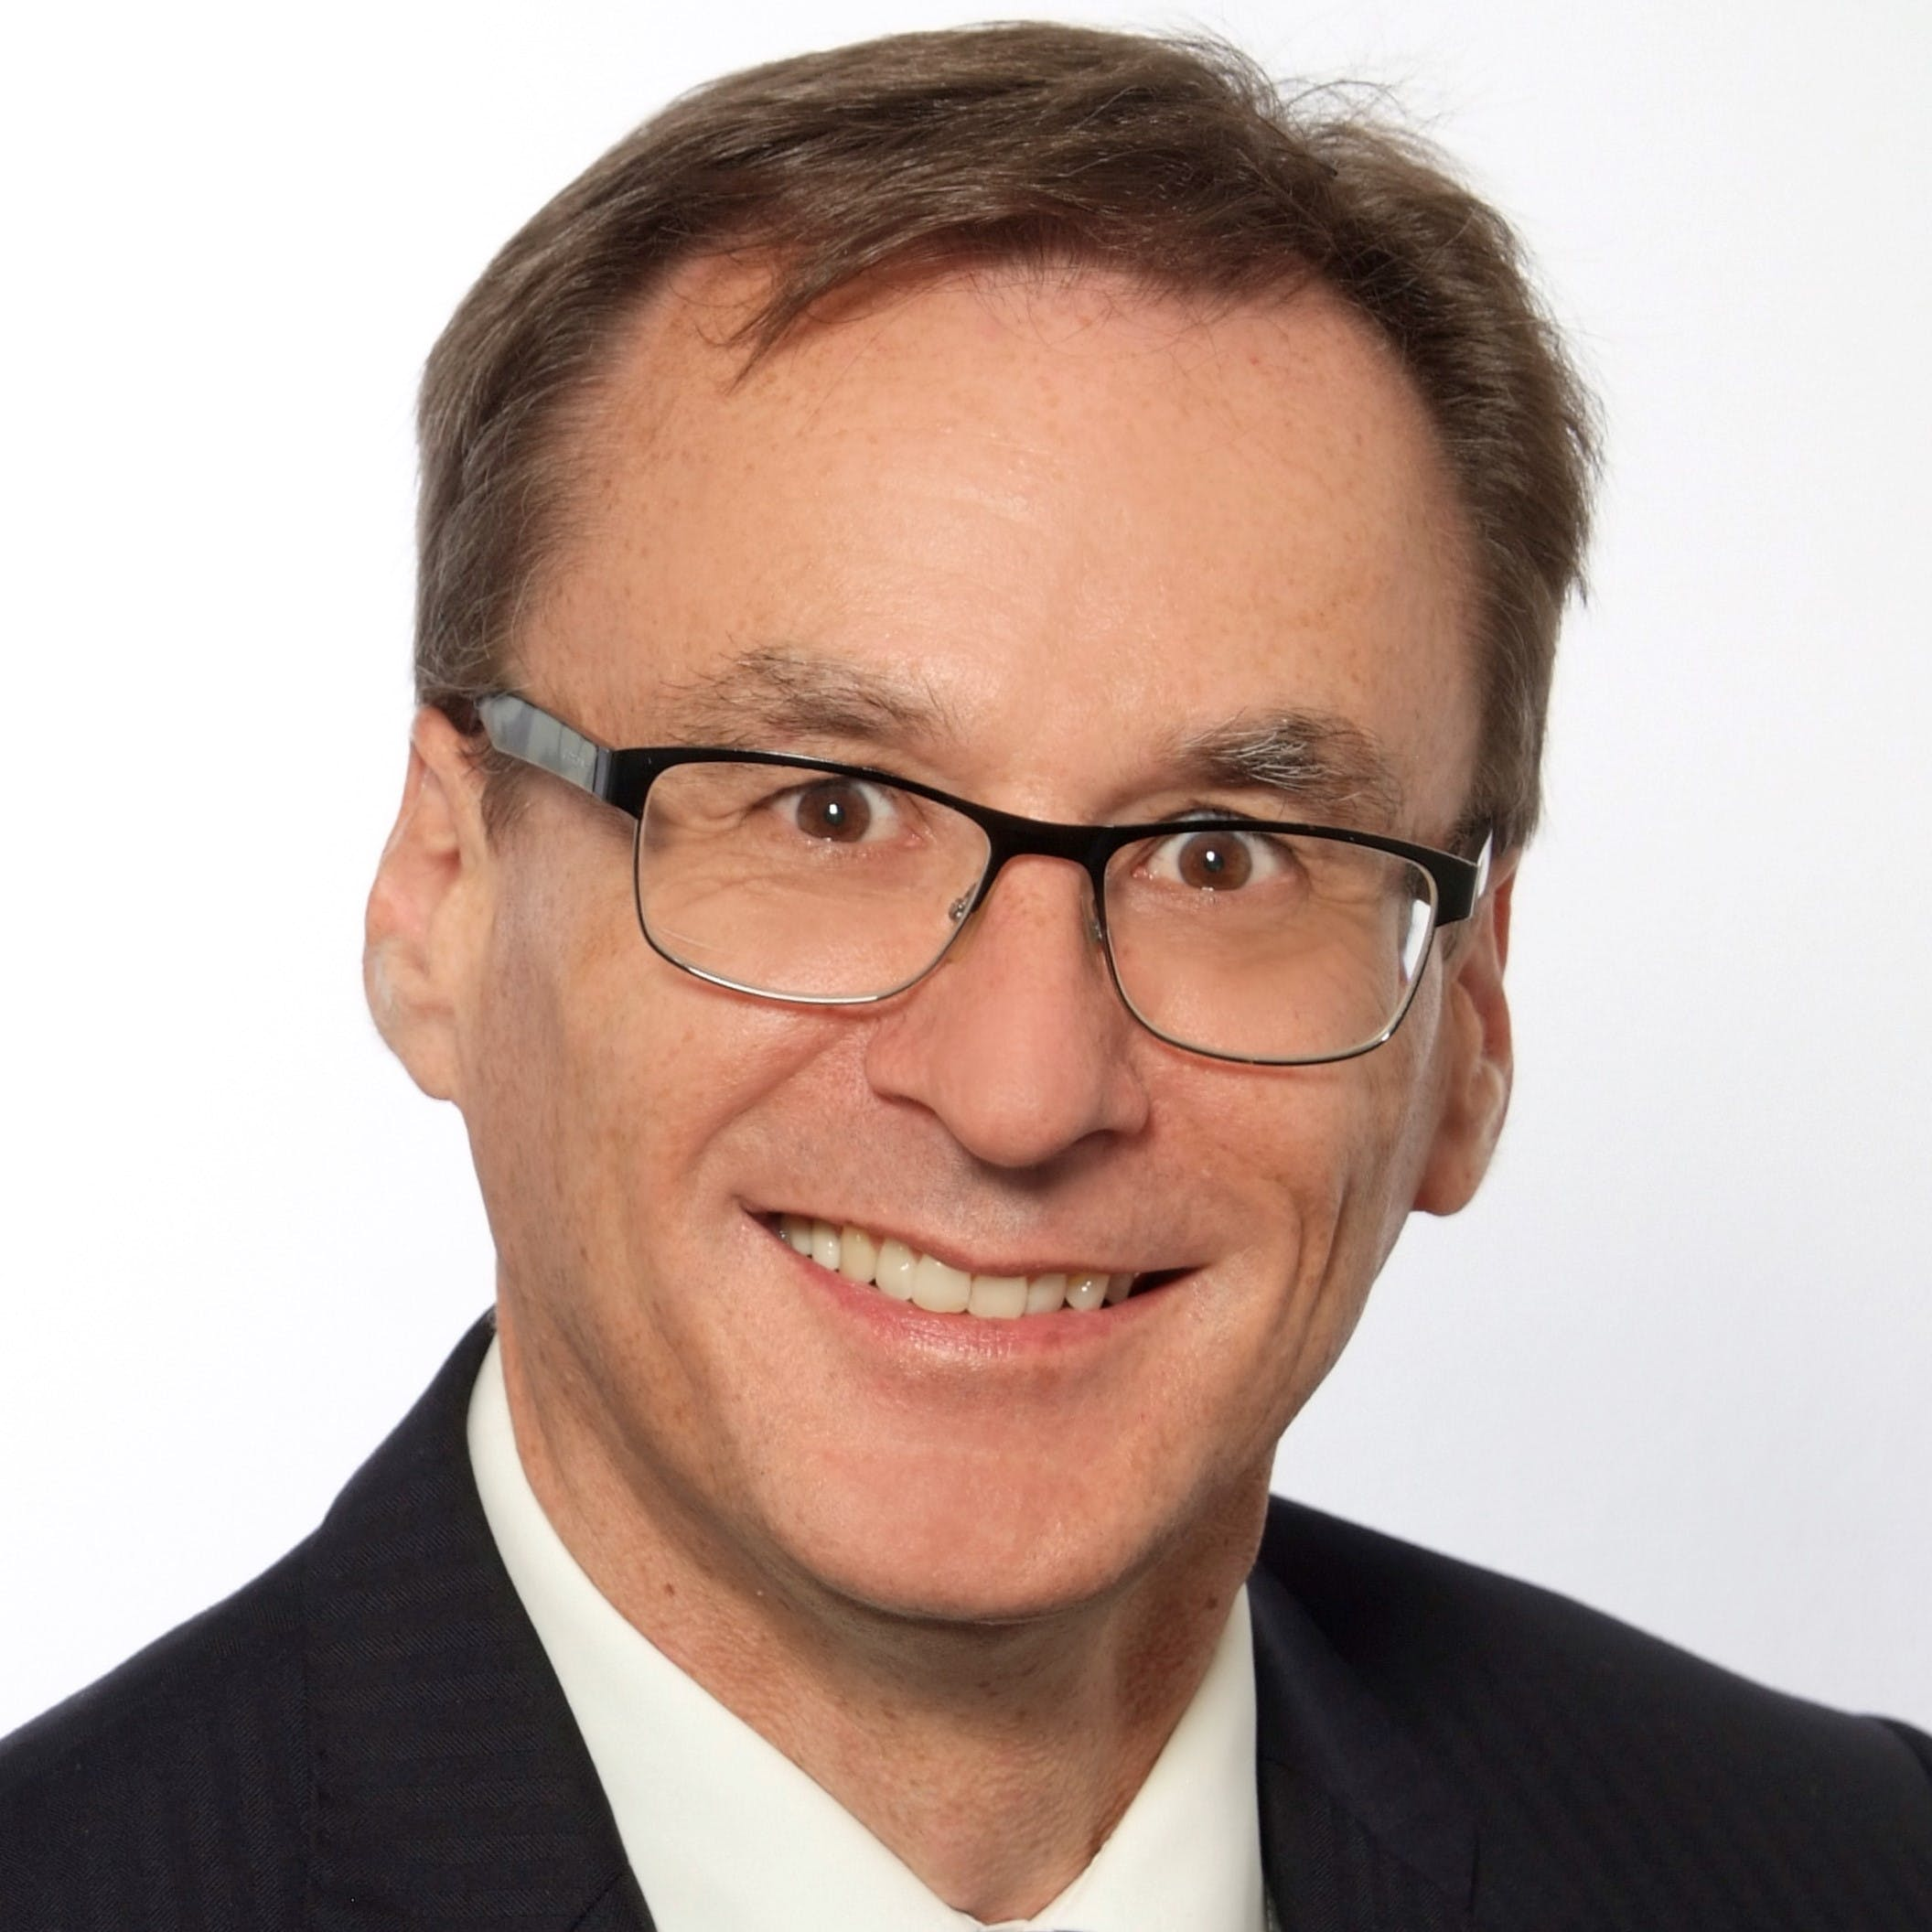 Dietmar Karepin